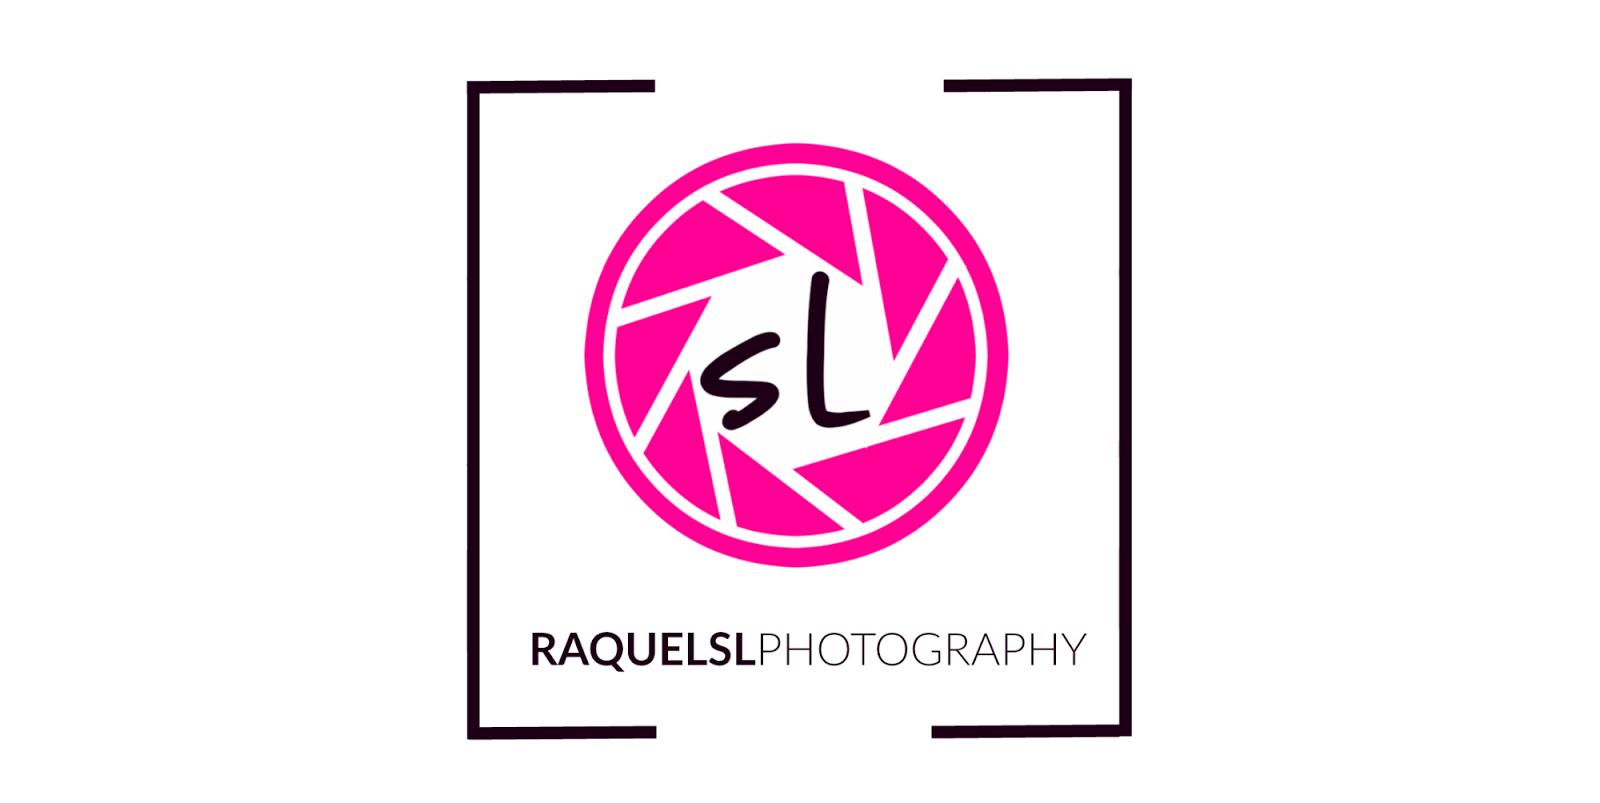 RaquelSLphotography